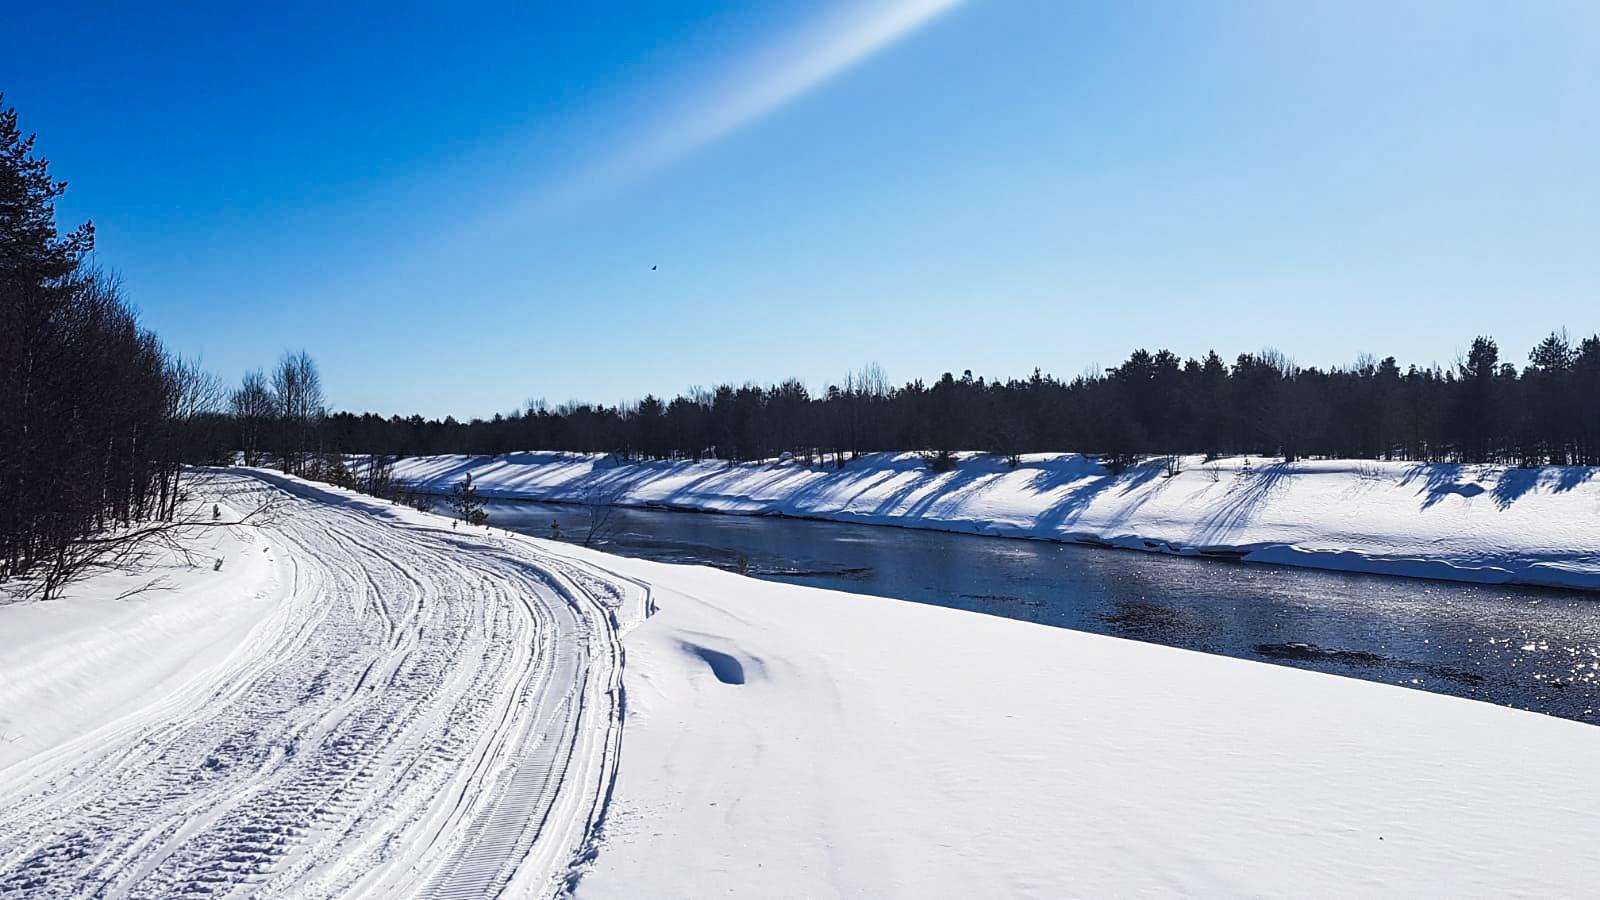 river in snowy landscape